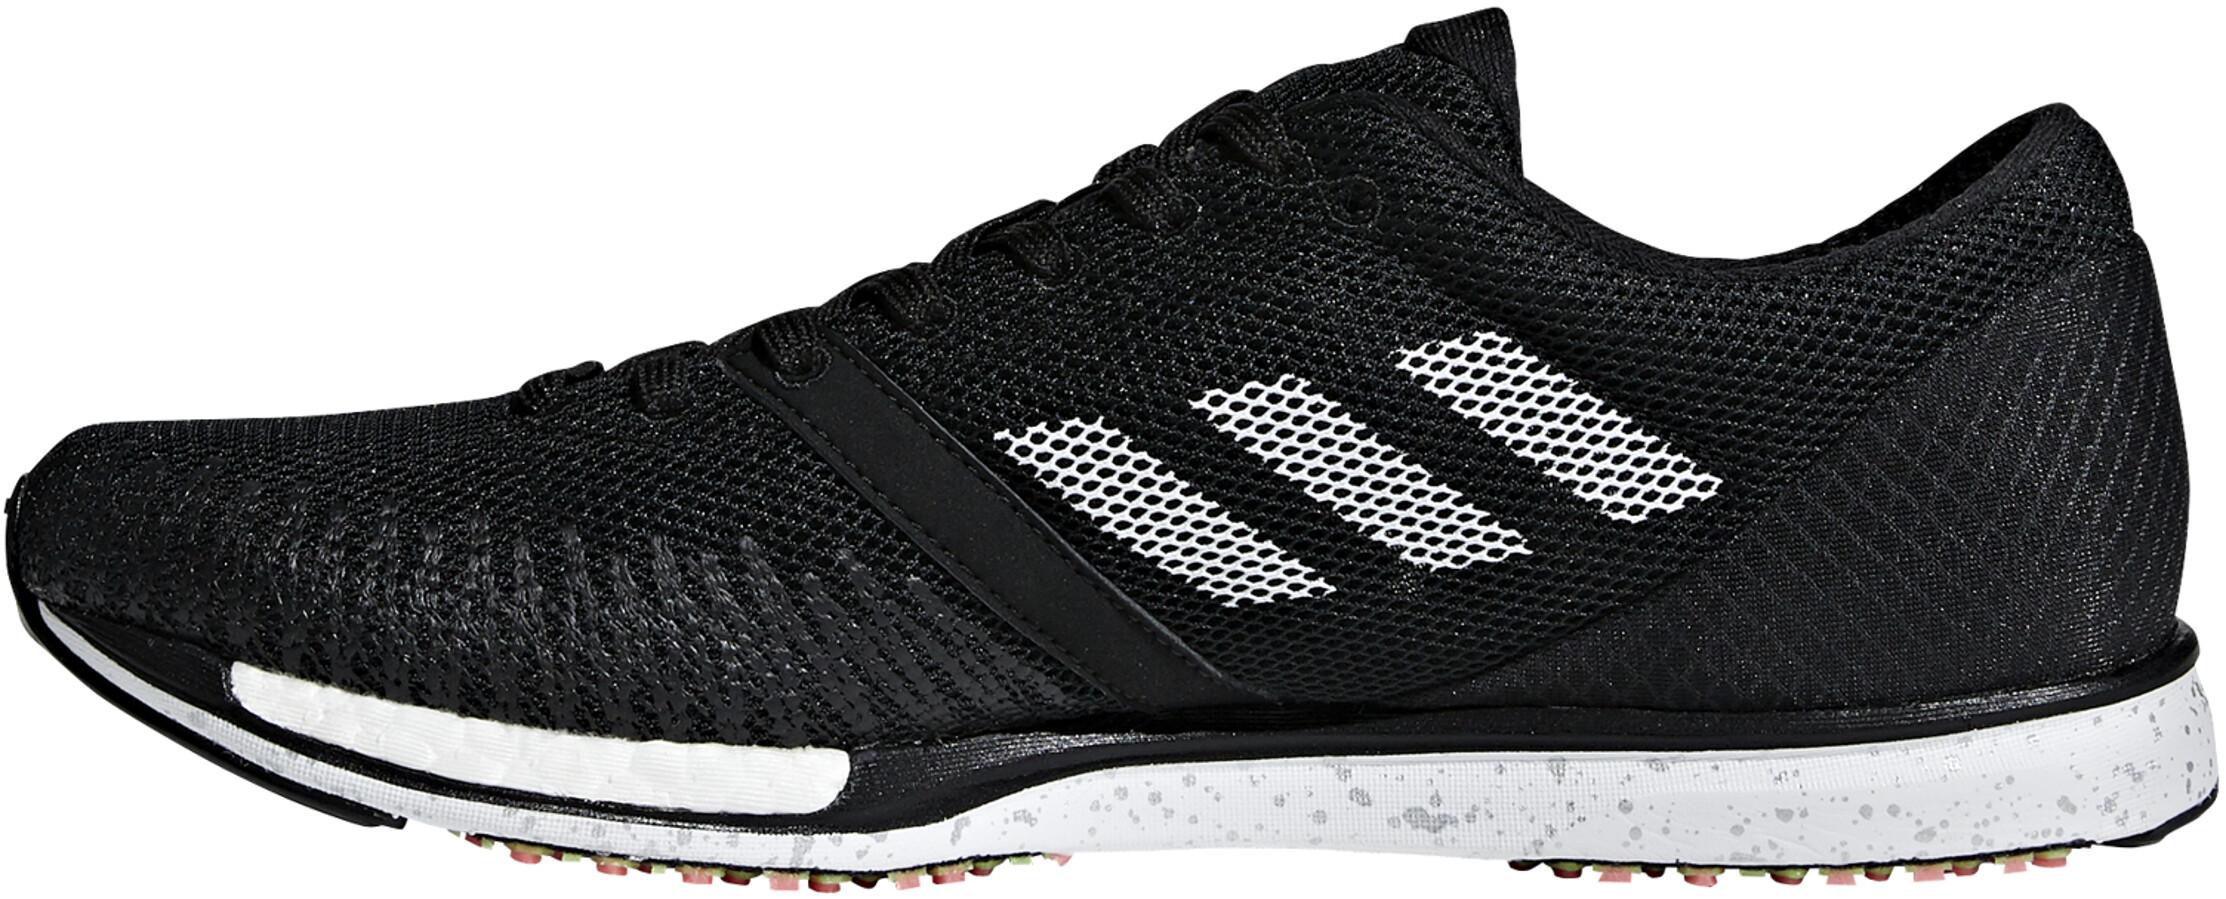 reputable site b420f 1097d adidas Adizero Takumi Sen 5 scarpe da corsa Uomo nero